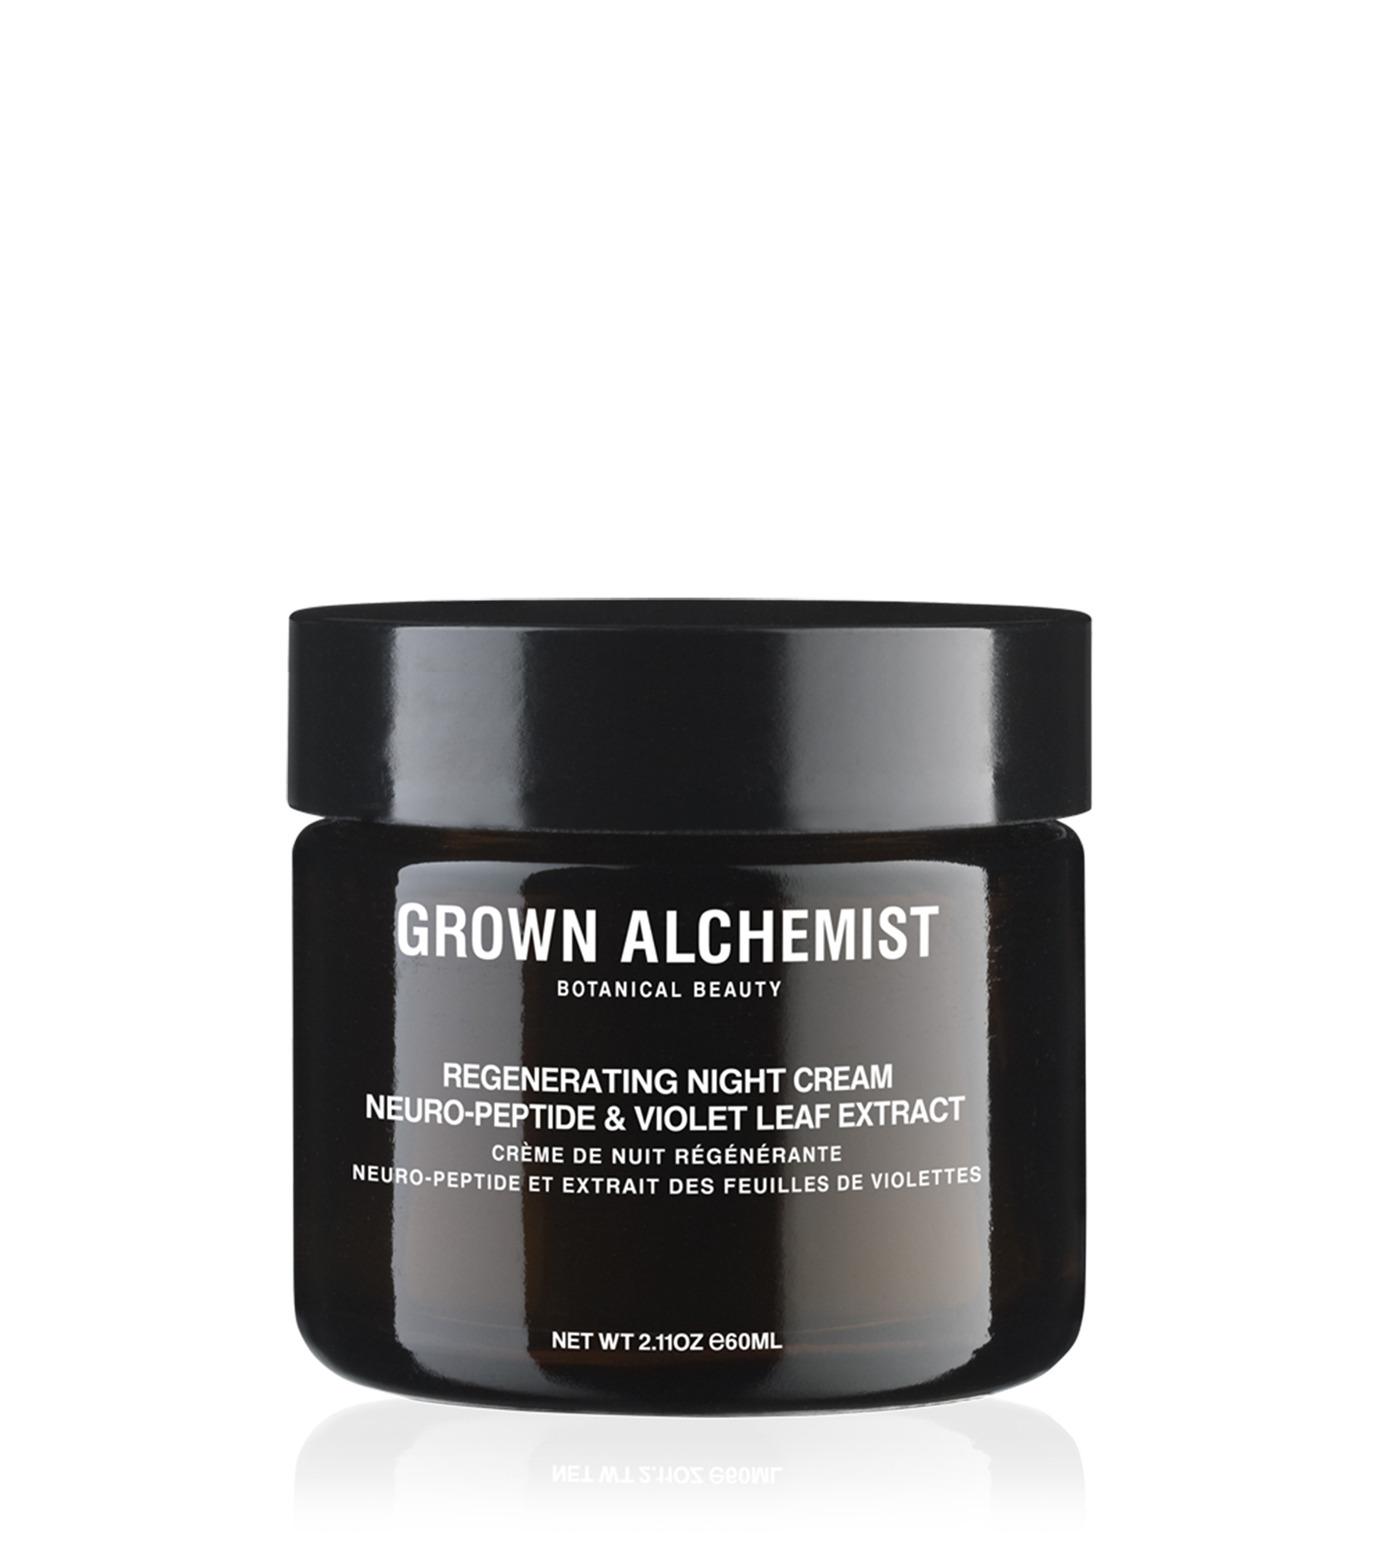 GROWN ALCHEMIST(グロウン・アルケミスト)のNight time Elixir Cream-DARK BROWN(BATH-BODY/BATH / BODY)-GRA0040-43 拡大詳細画像1